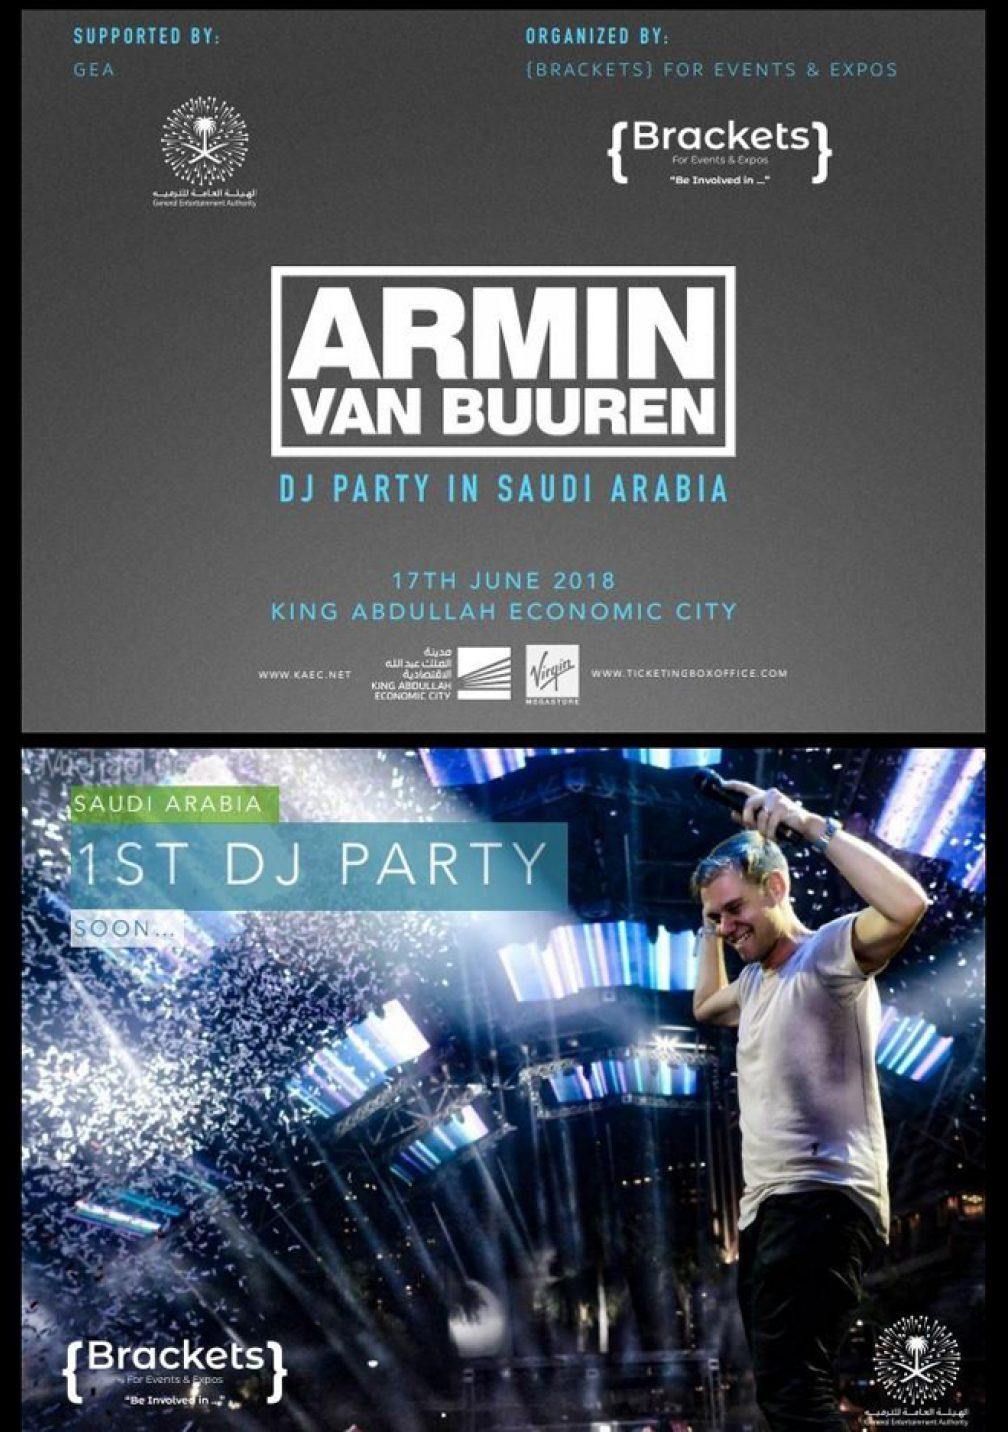 Armin van Buuren is playing the first ever